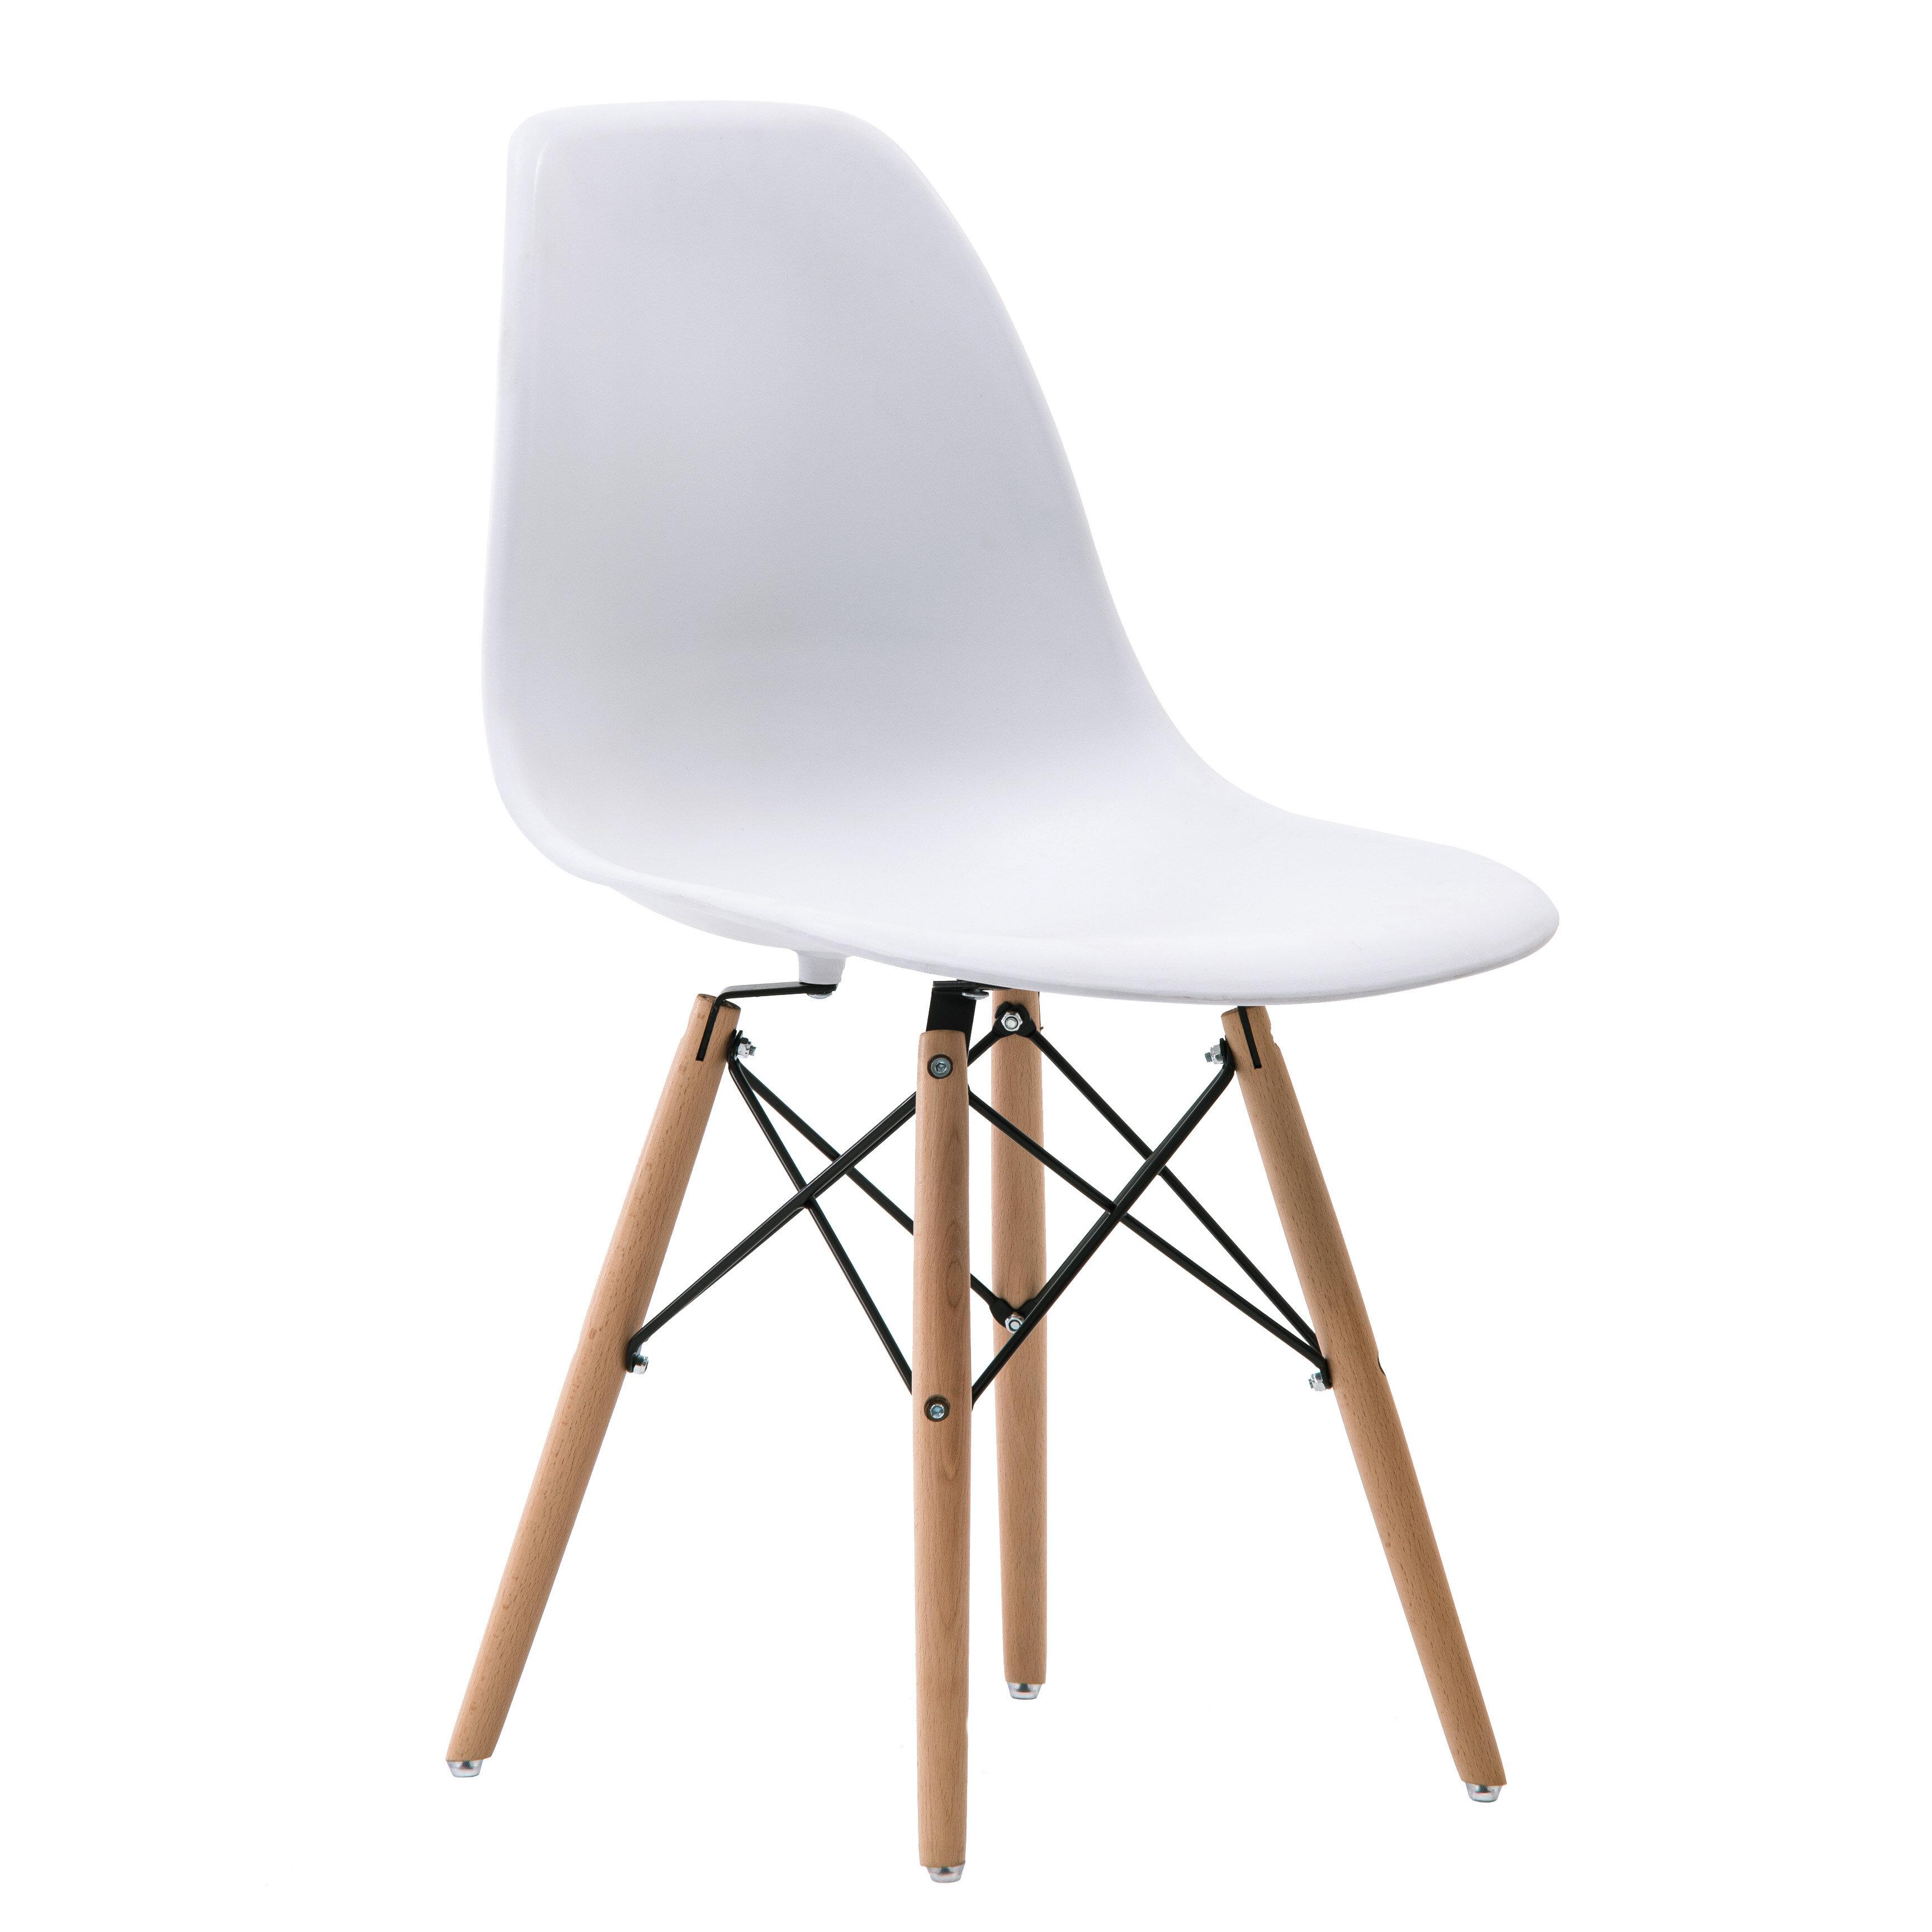 Wrenshall Social Mid Century Side Chair